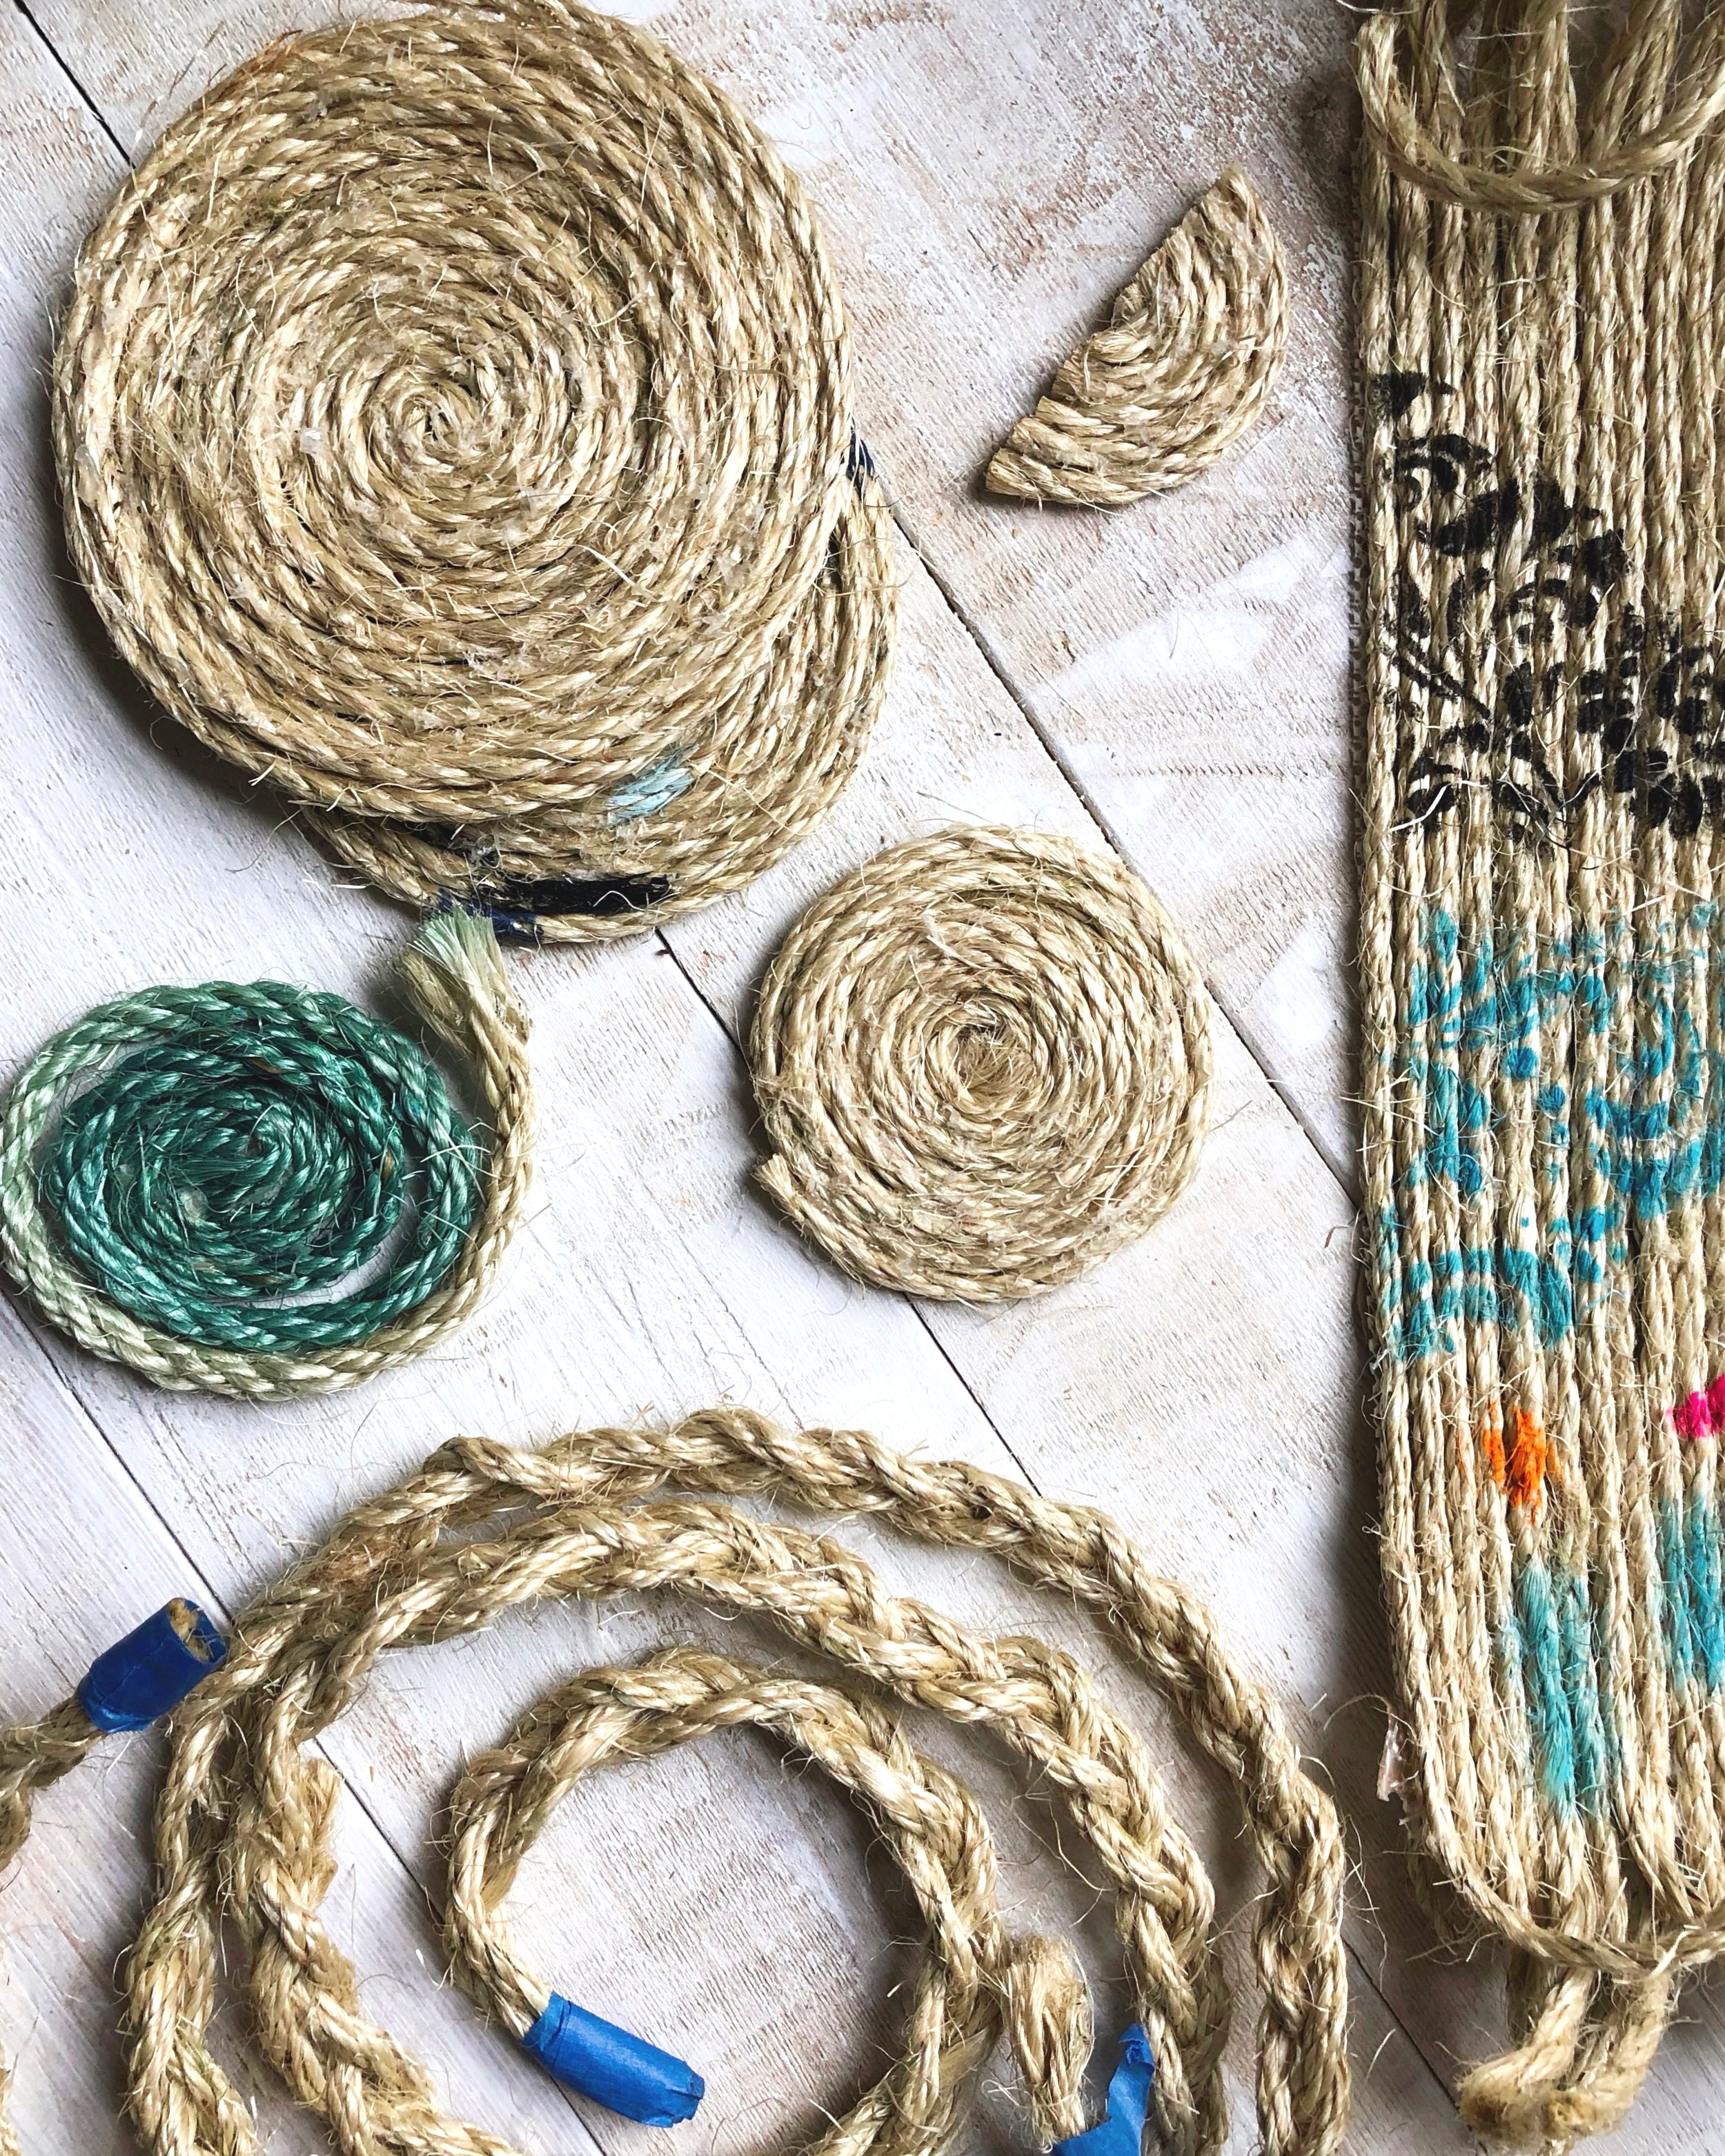 How to Make Your Own Large Boho Jute Rope Rug + How to Stencil on a Rug #homedecor #juterope #rugdiy #stencil #boho #easydiy #bohostyle